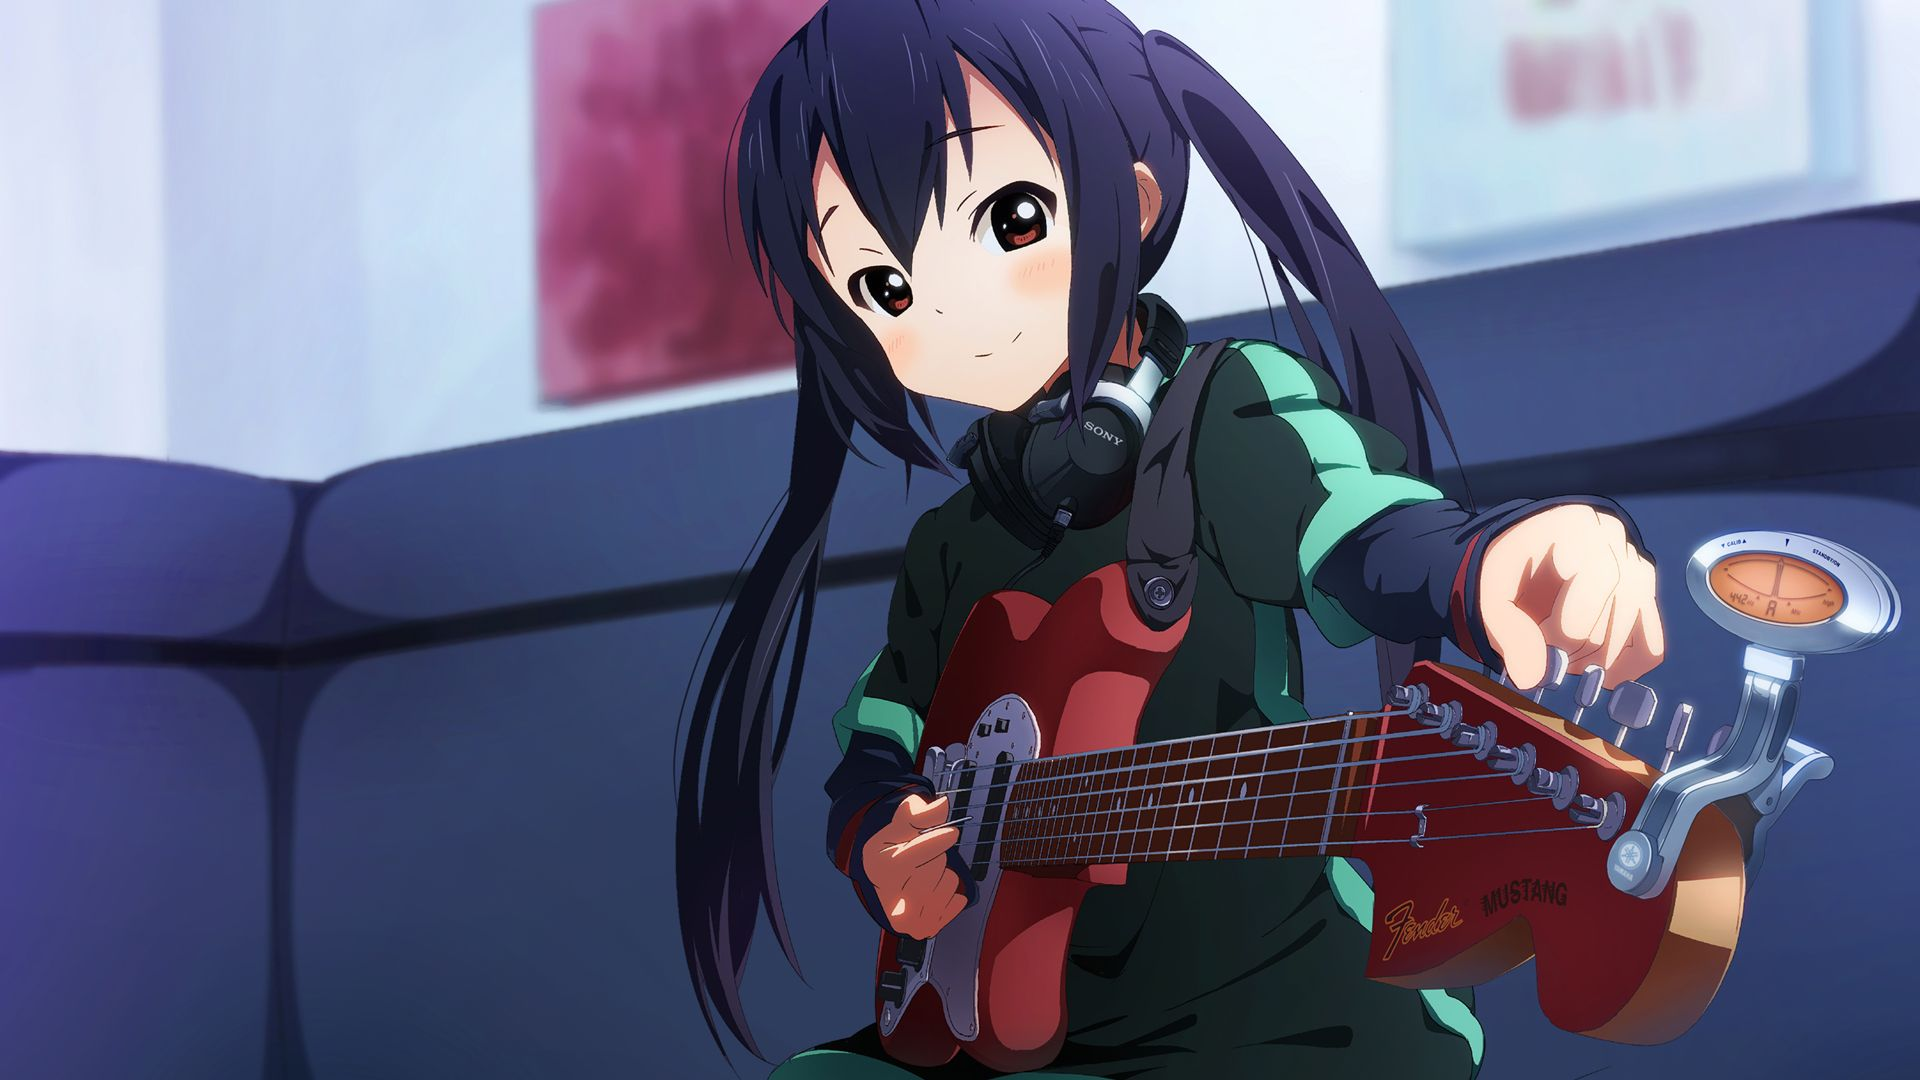 K On Black Hair Brown Eyes Bun150 Guitar Instrument Long Hair Nakano Azusa Twintails Wallpaper 1920x1080 125783 Wallpa Azusa Anime Brown Eyes Black Hair